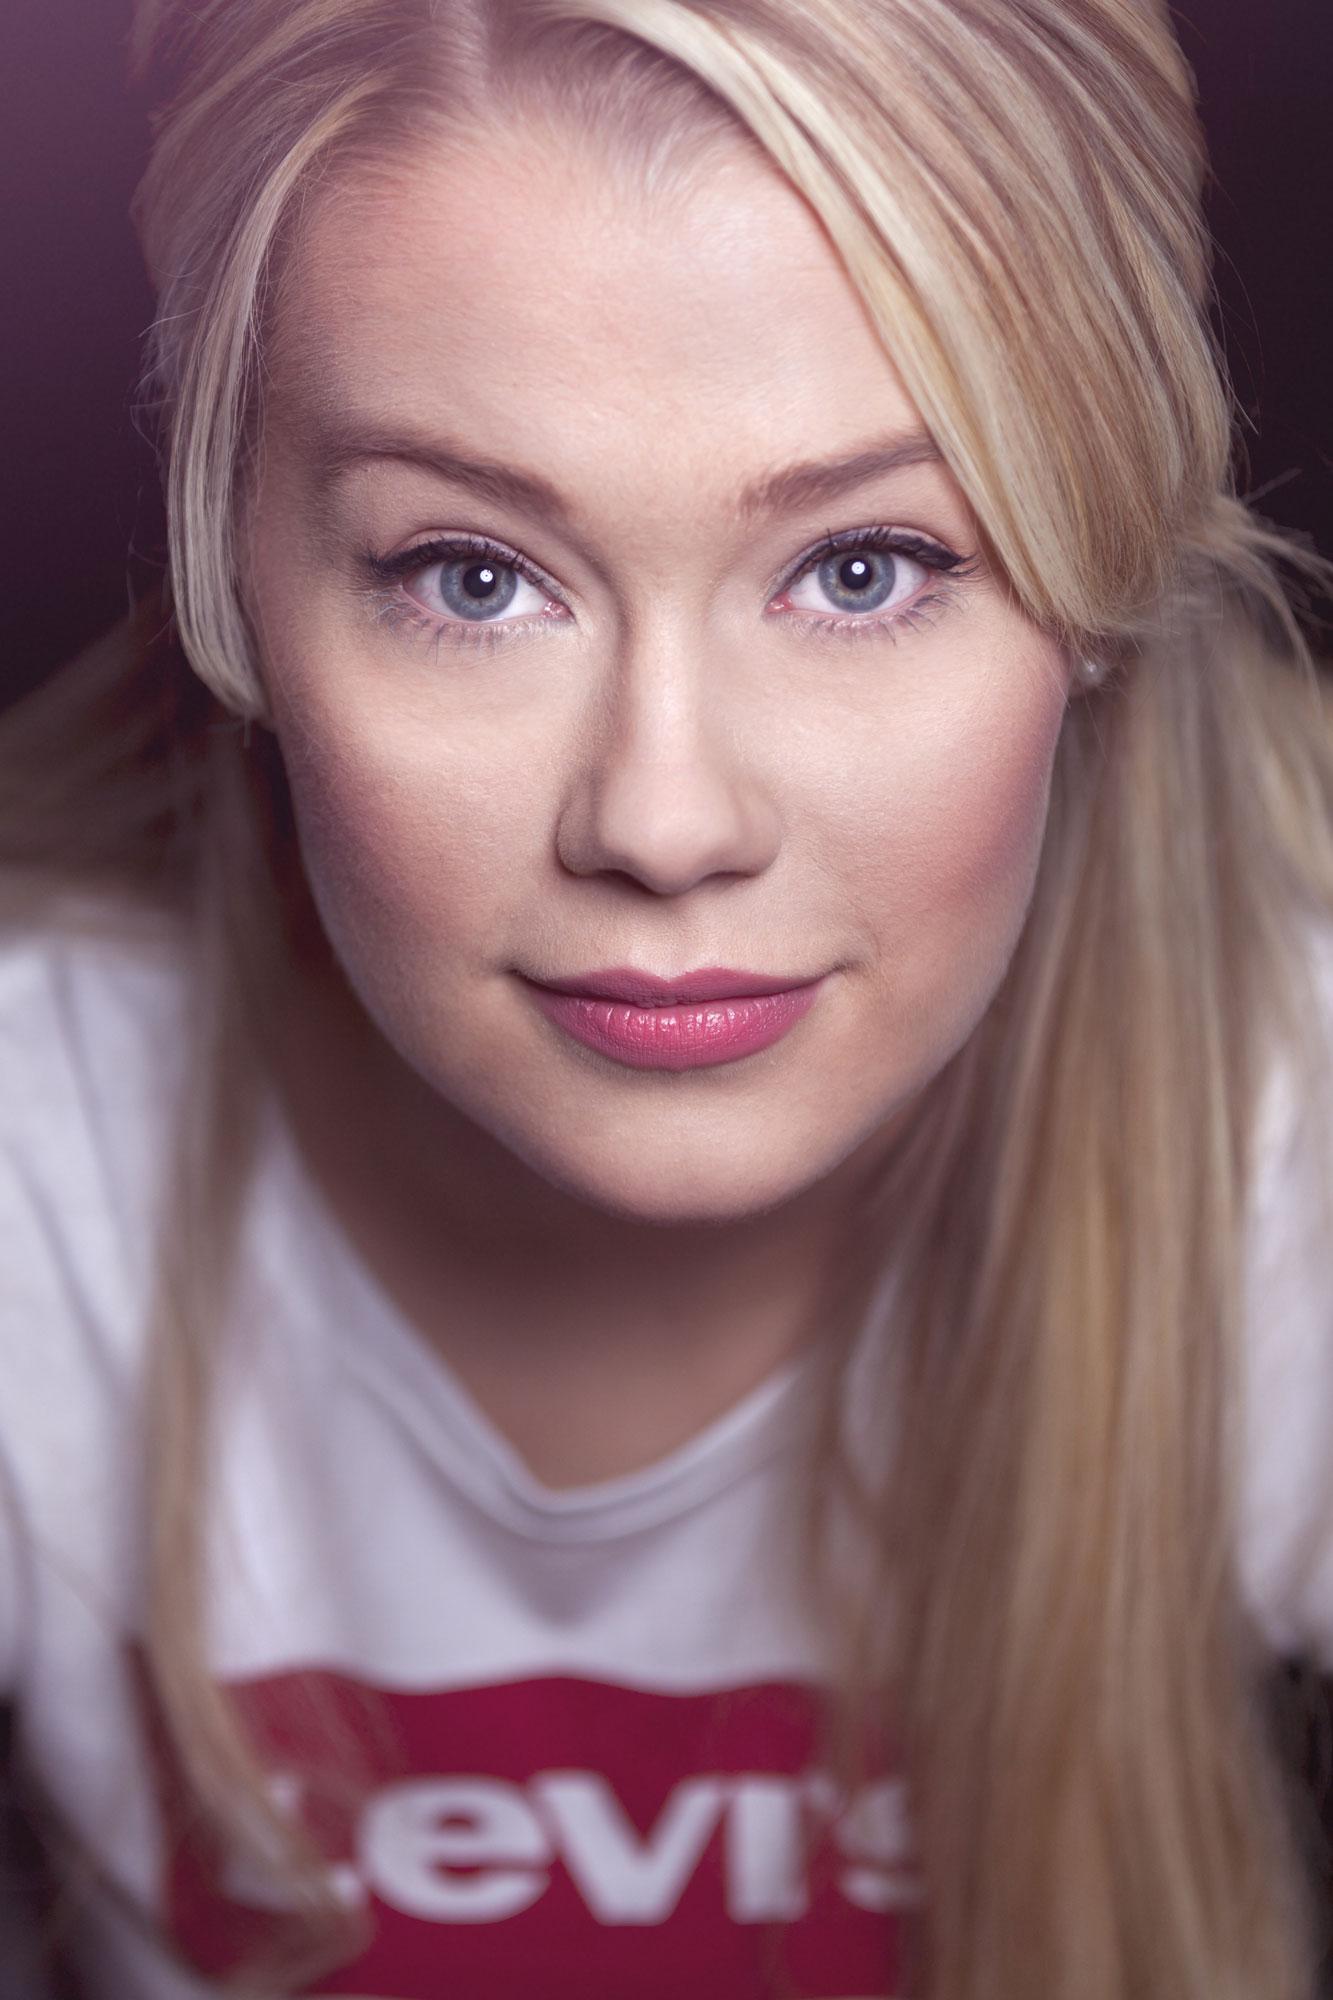 Aylin Werner